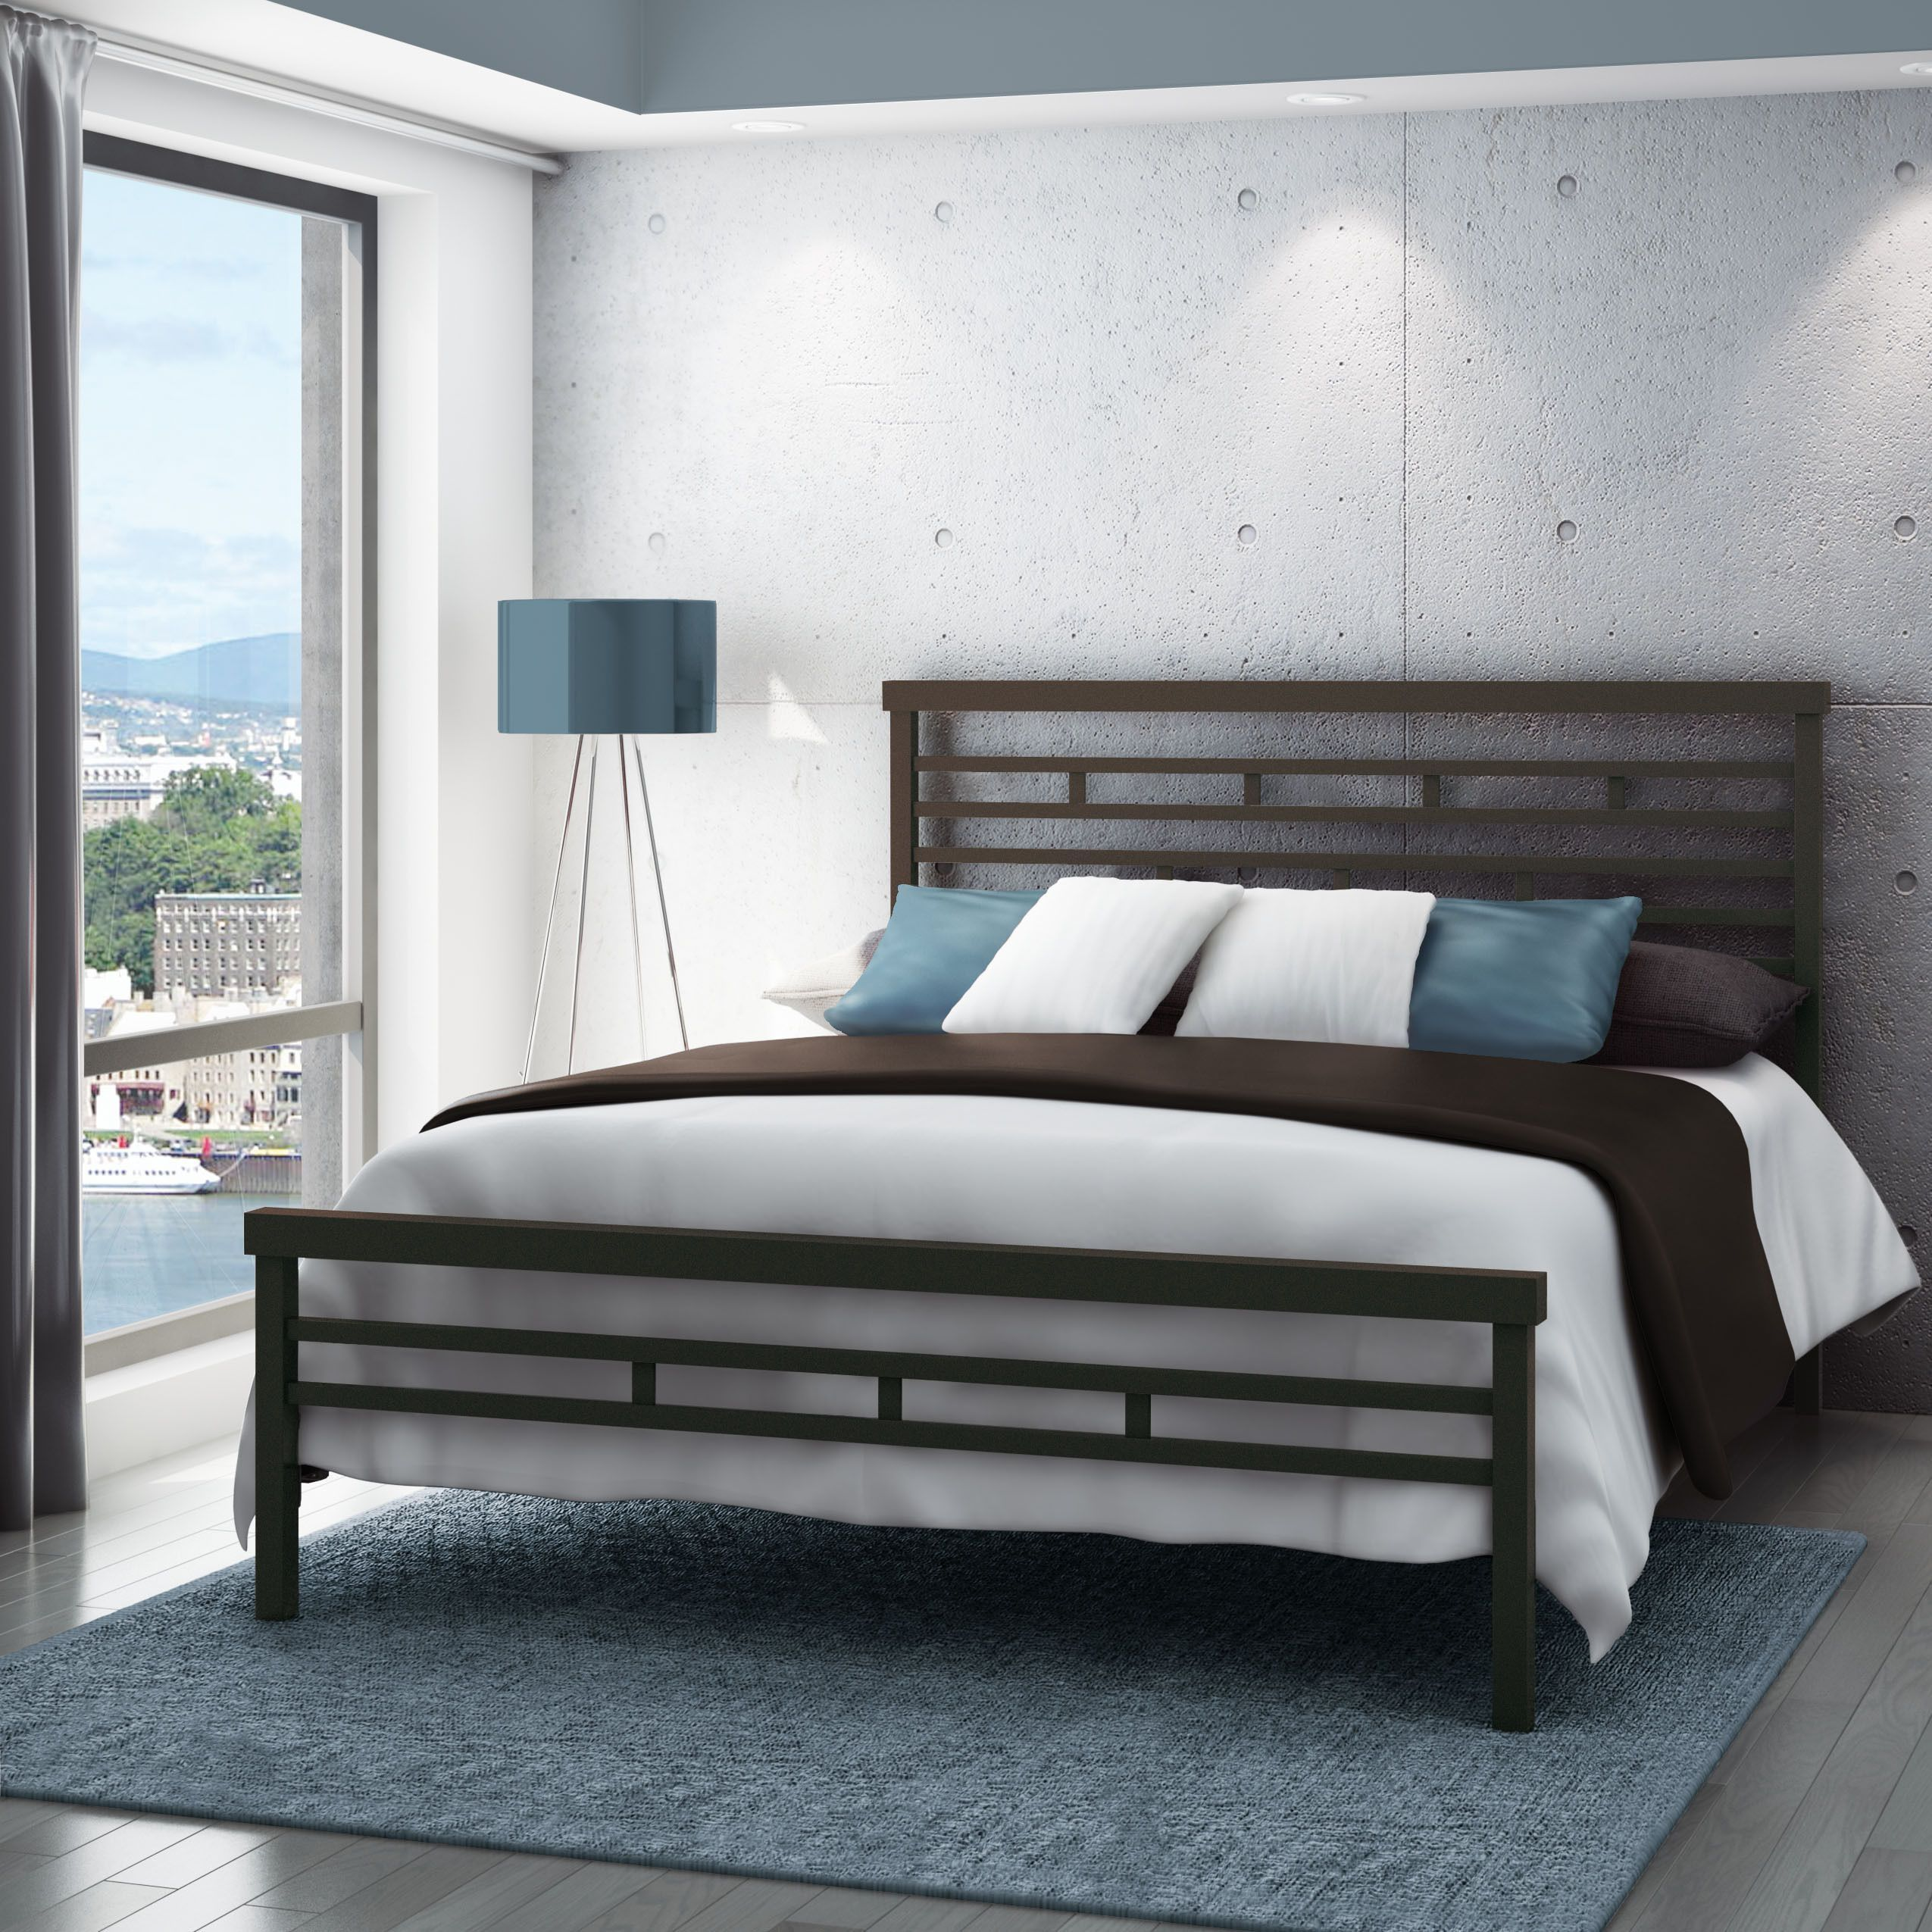 Amisco 60-inch Highway Queen Size Metal Bed (Queen Size in Glossy ...